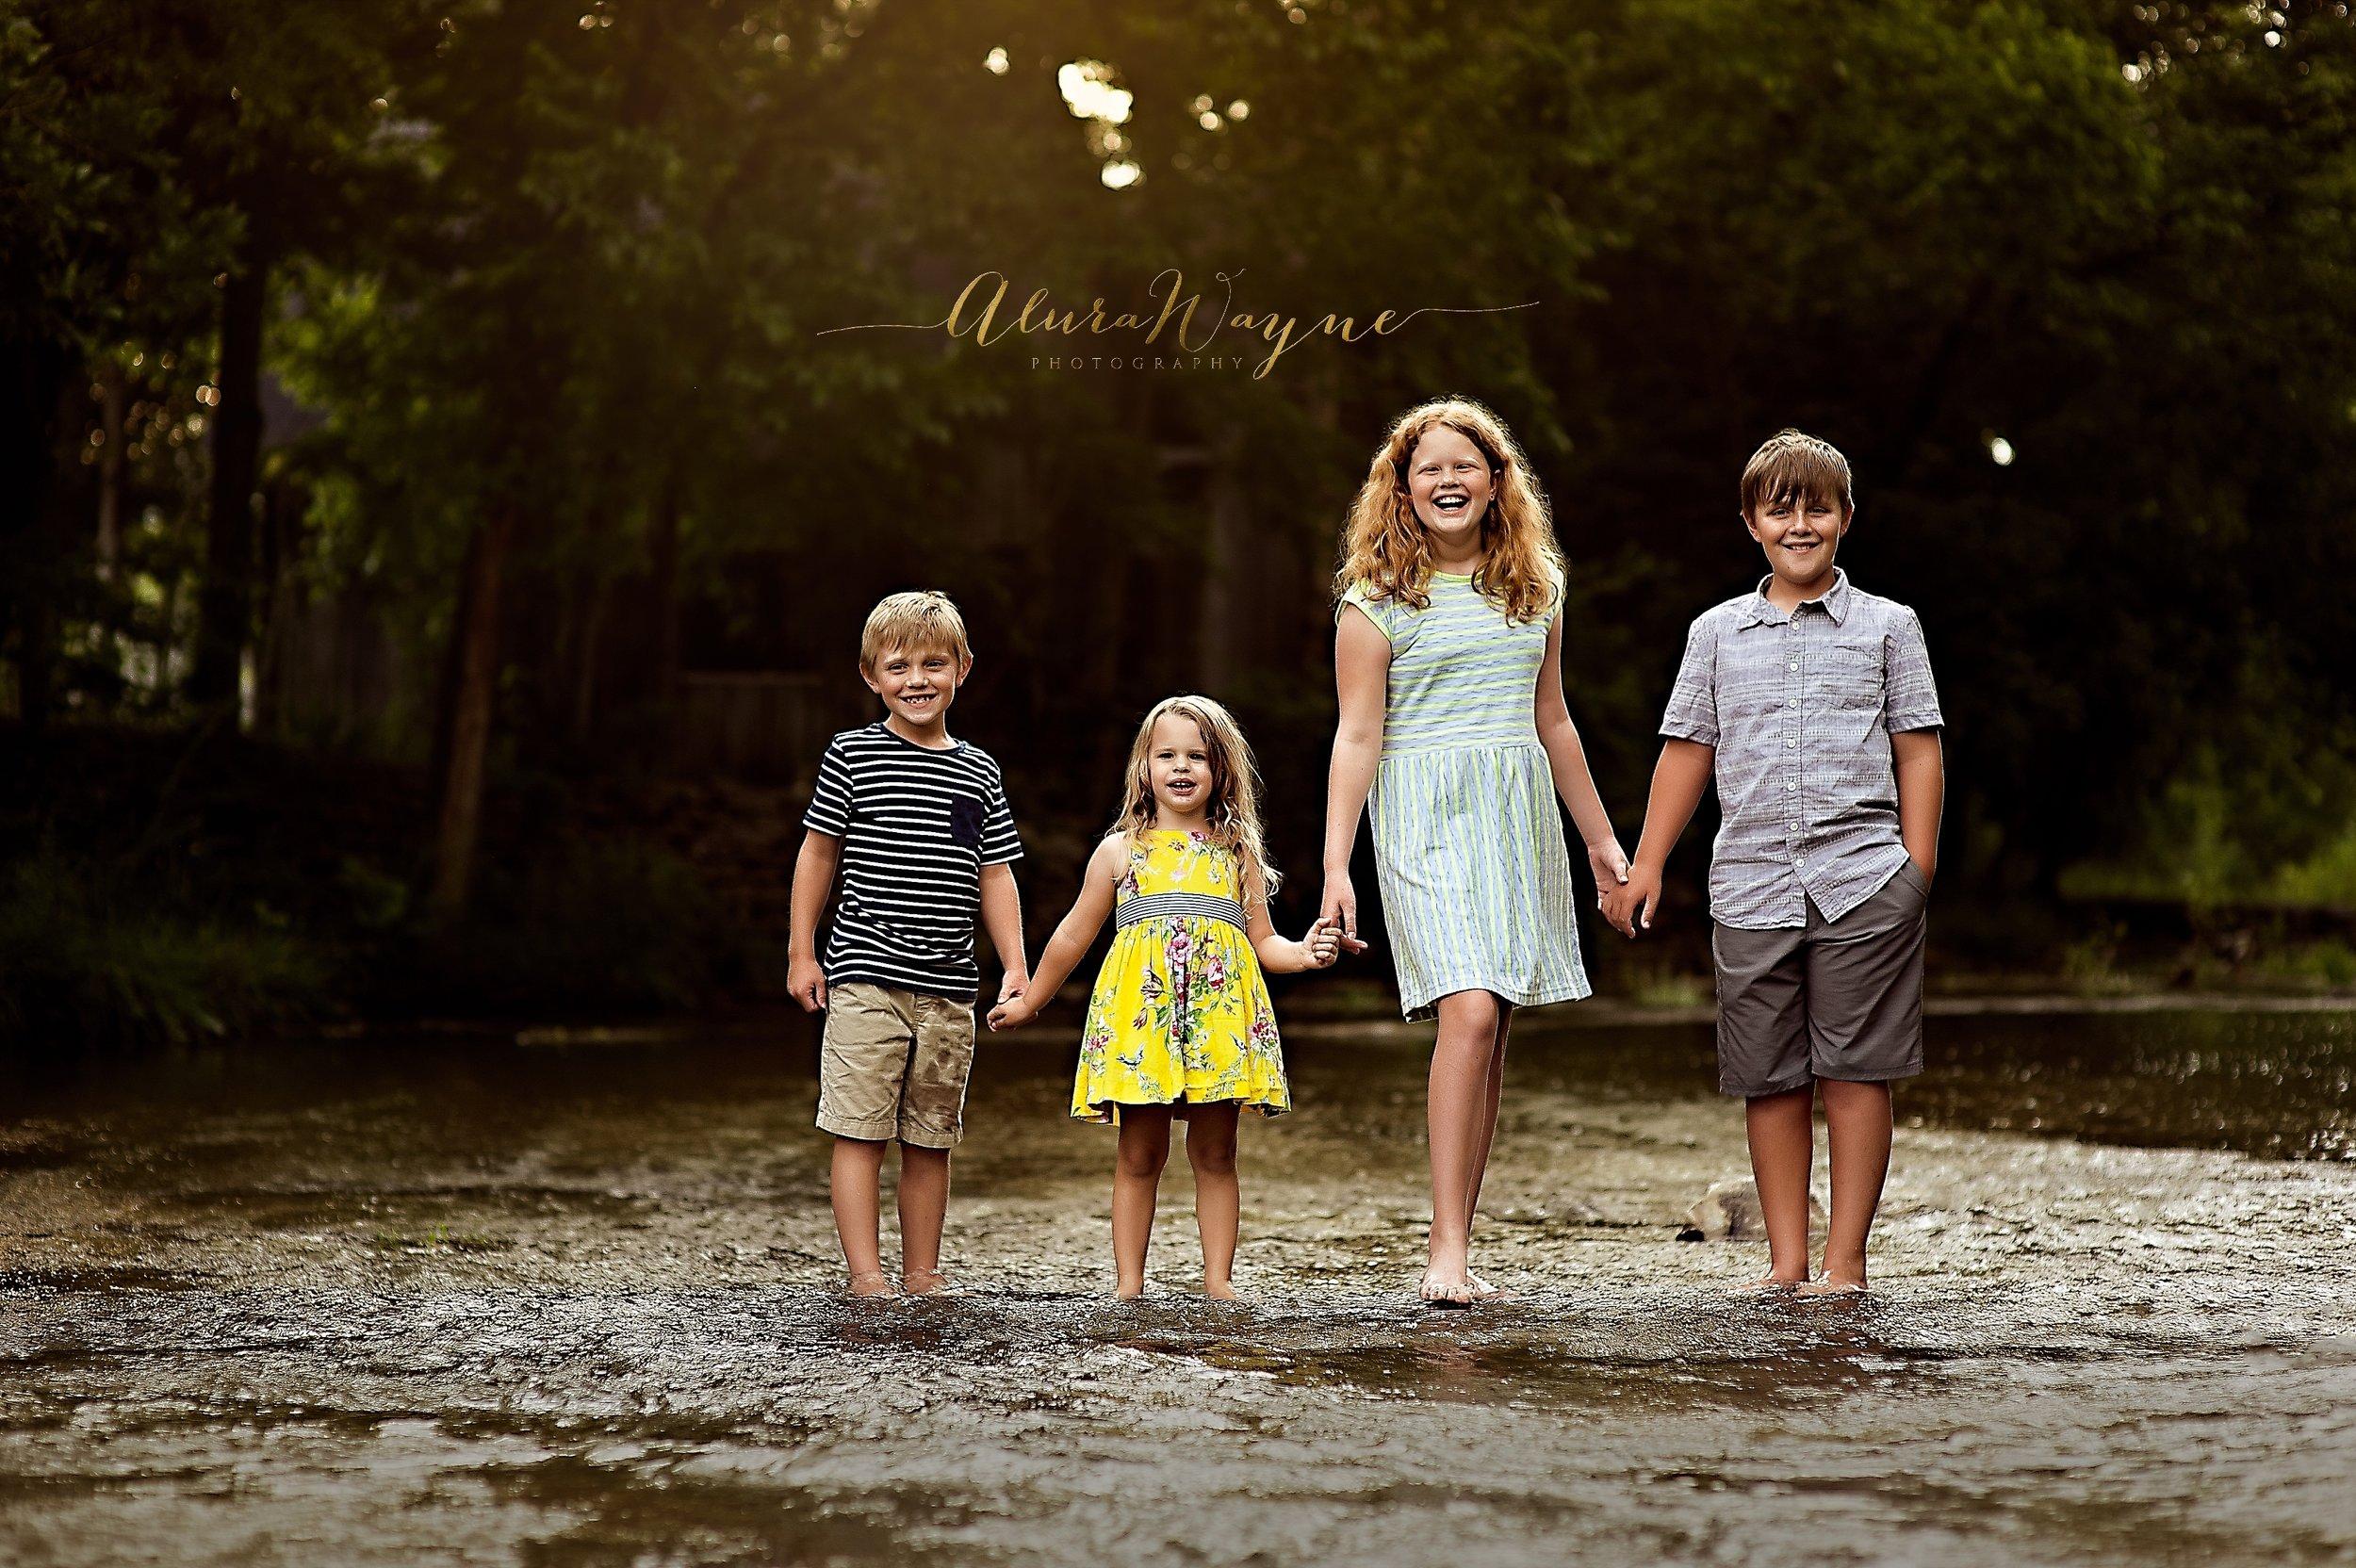 Our four beautiful children: Ayden, Elowen, Madeline, and Tilden.